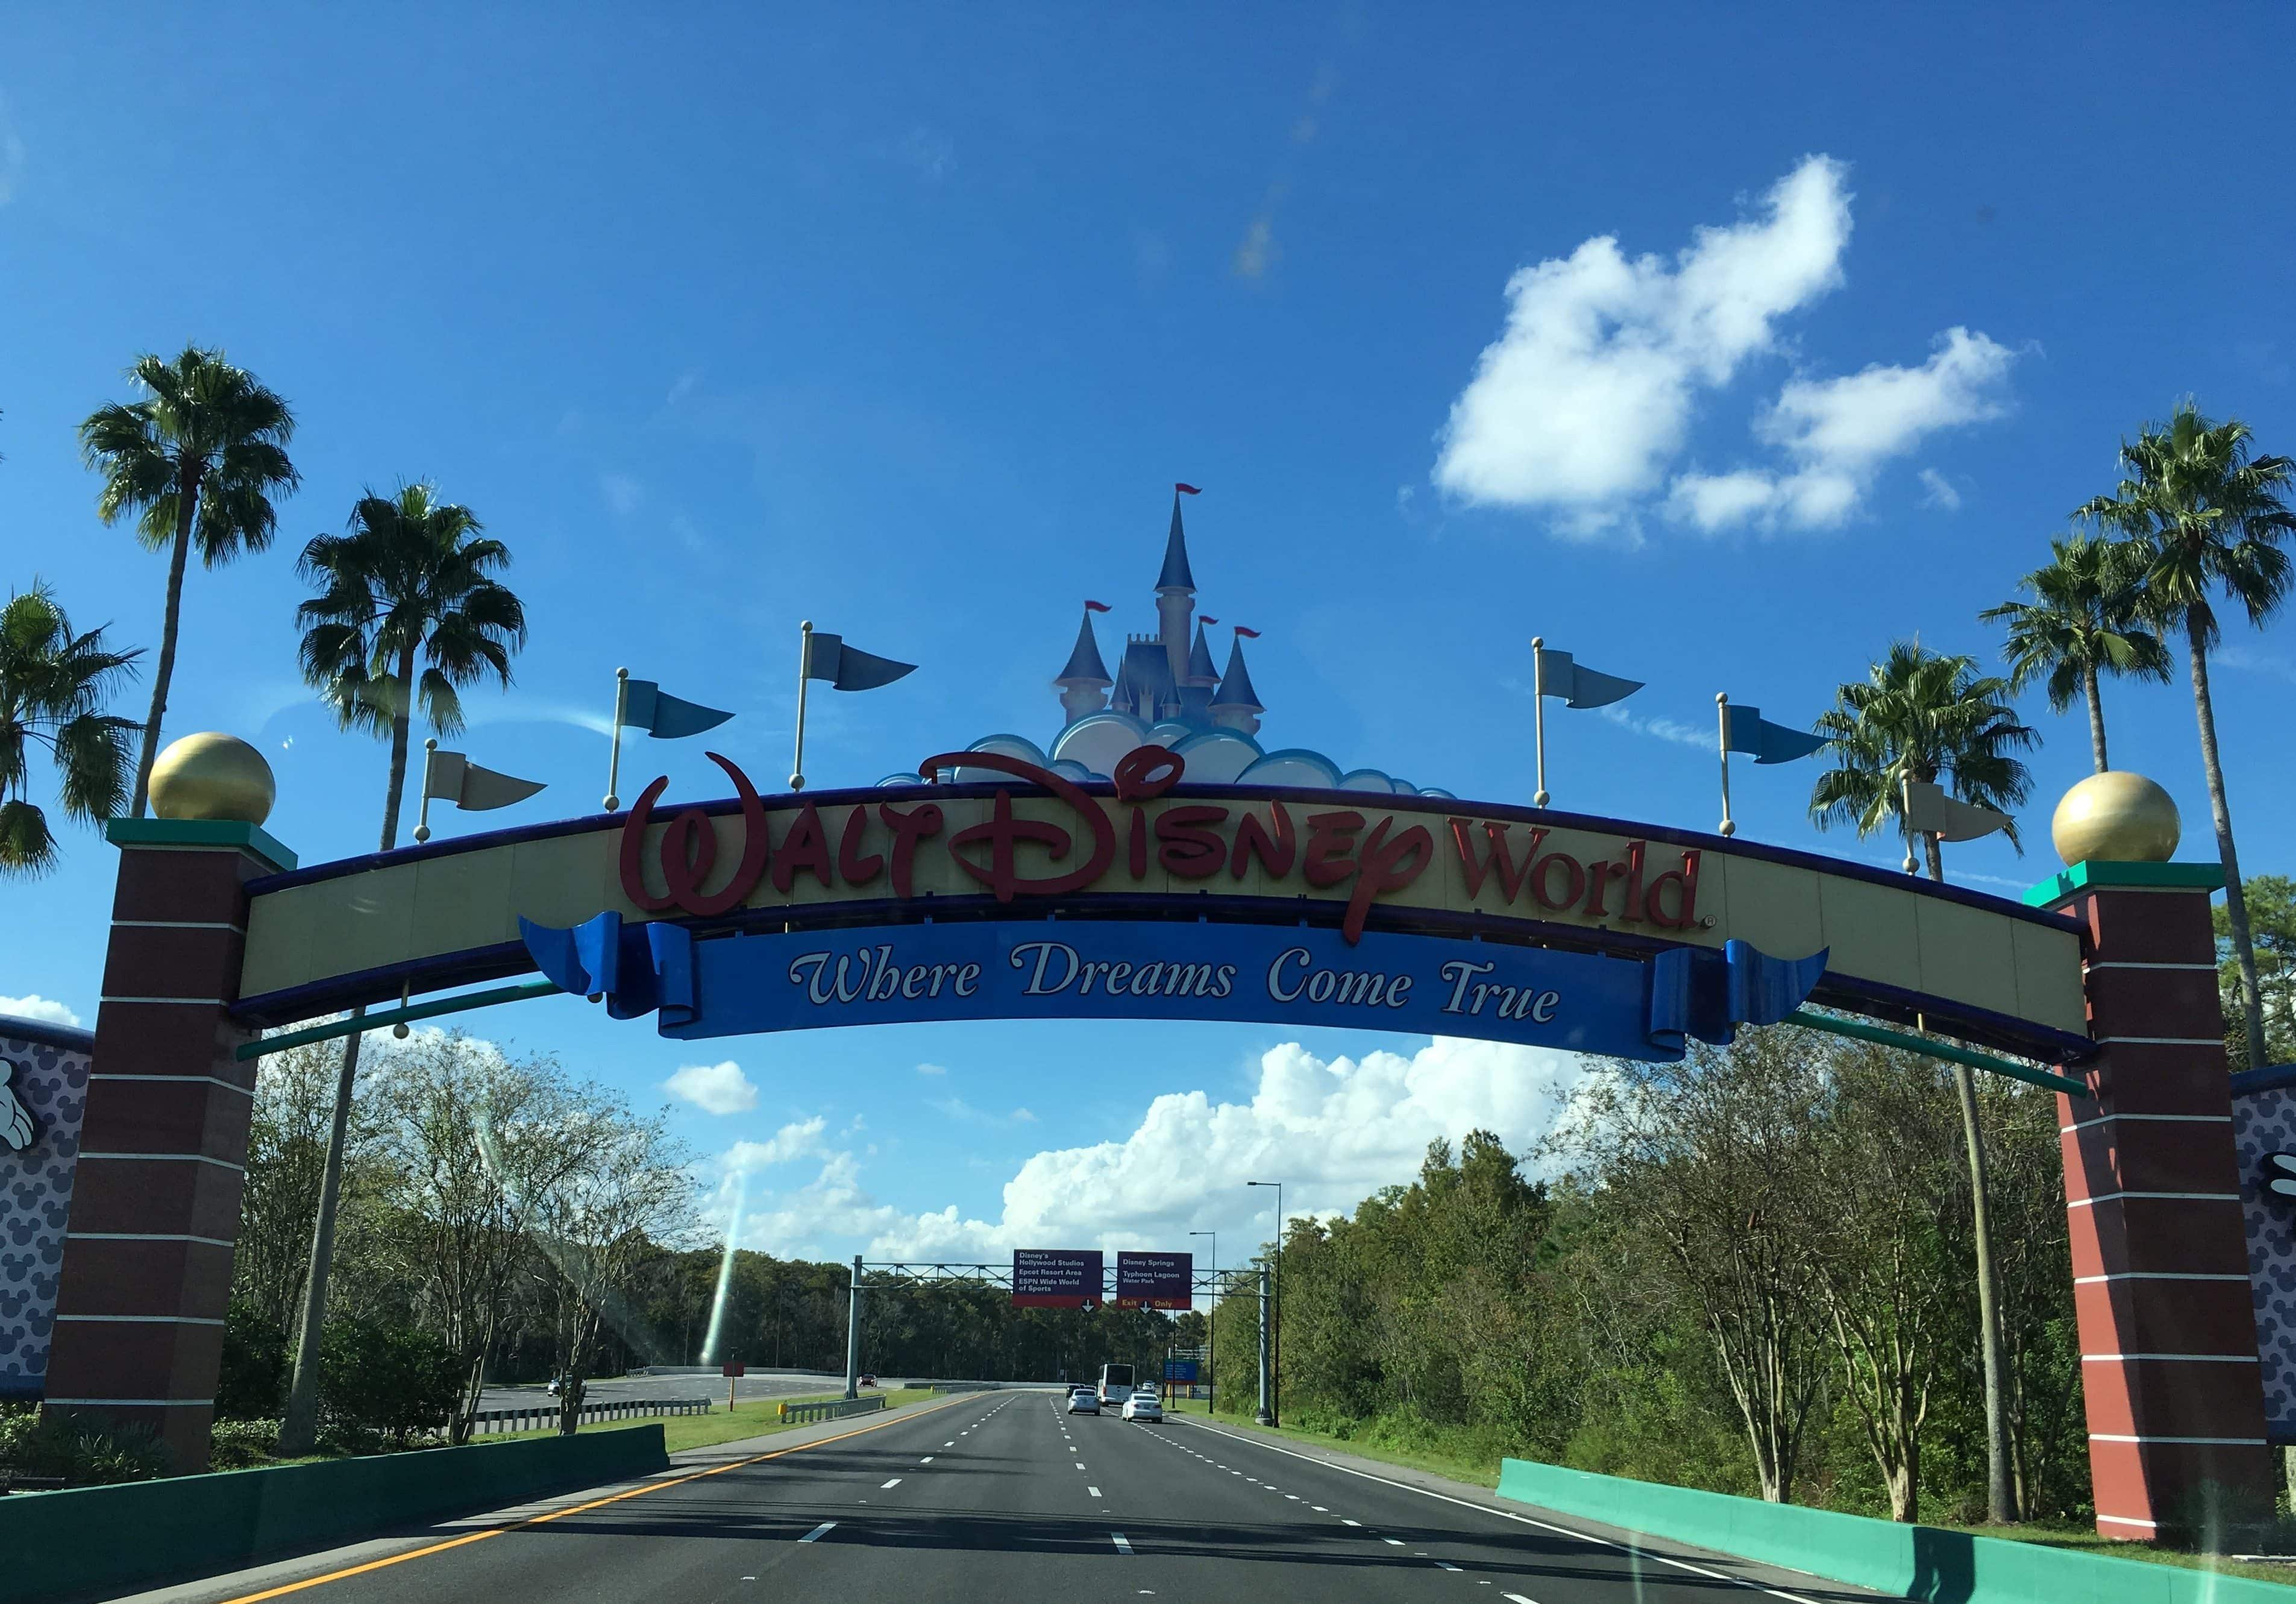 Fort Wilderness is an onsite property at Orlando's Walt Disney World Resort.